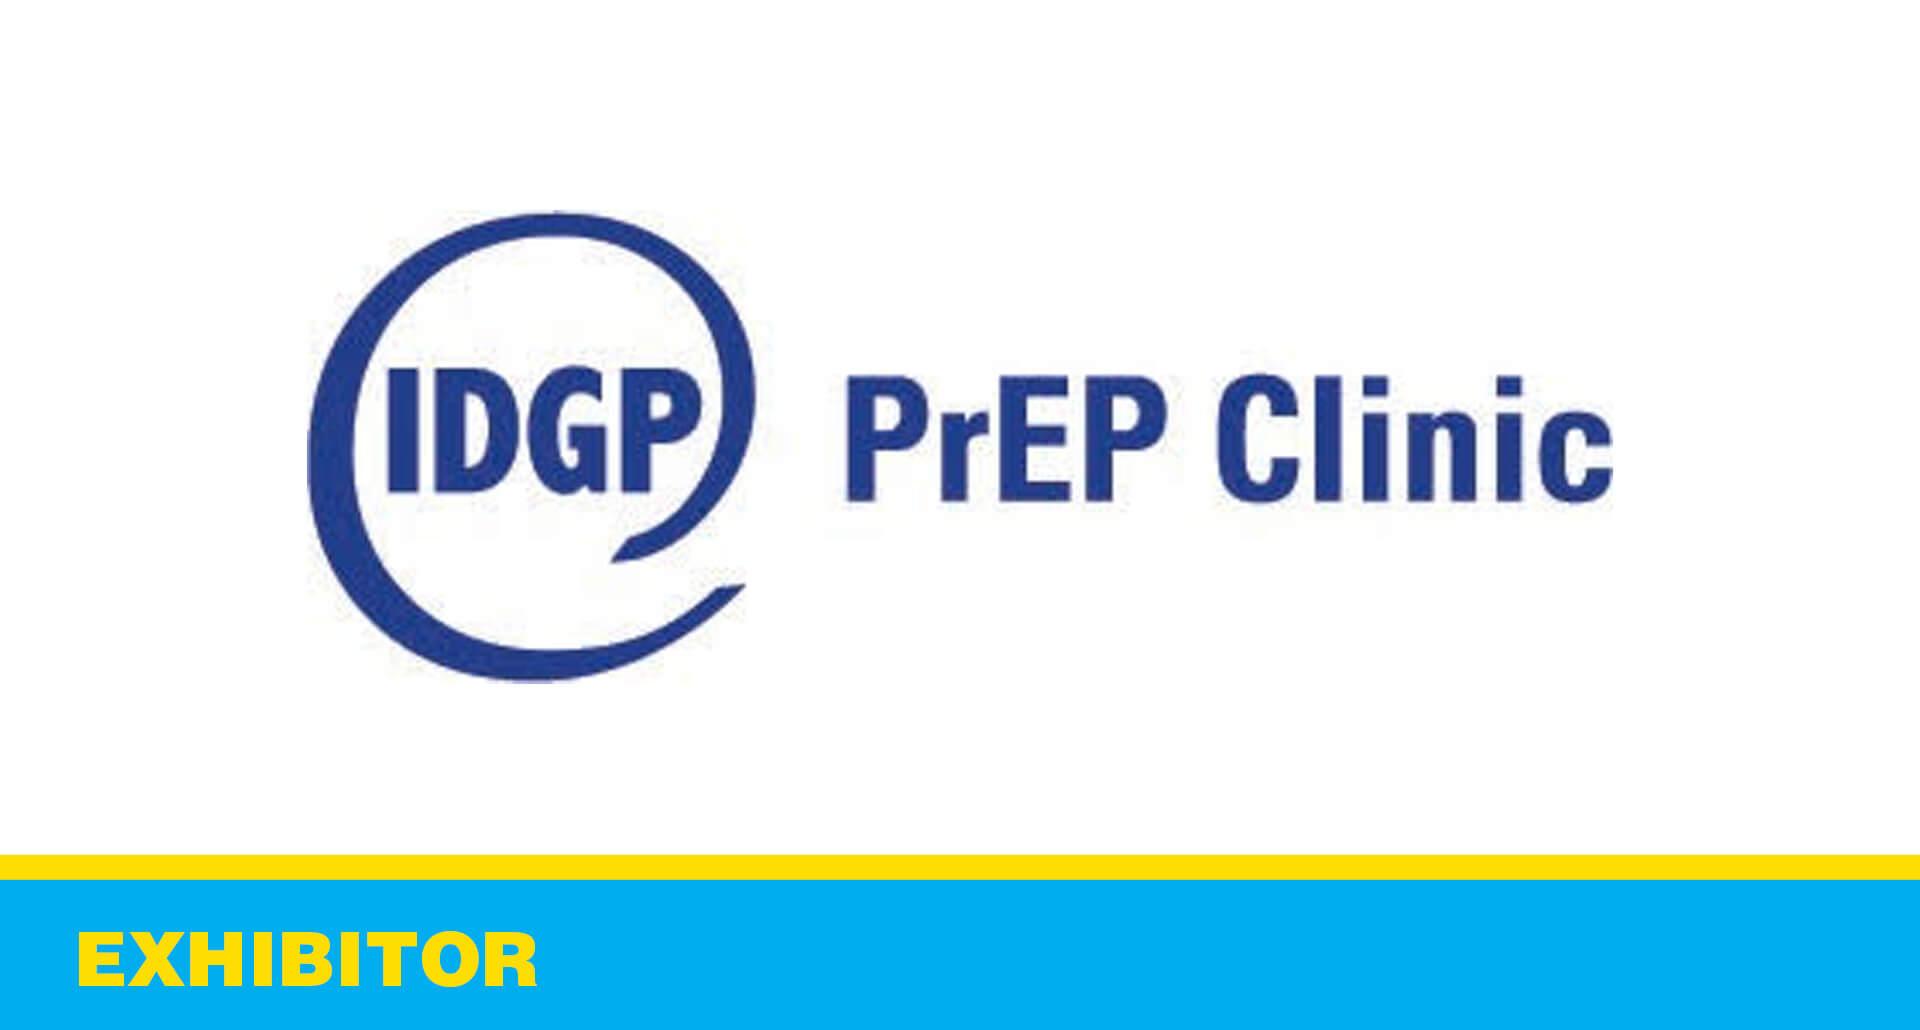 University of Colorado Hospital IDGP PrEP Clinic